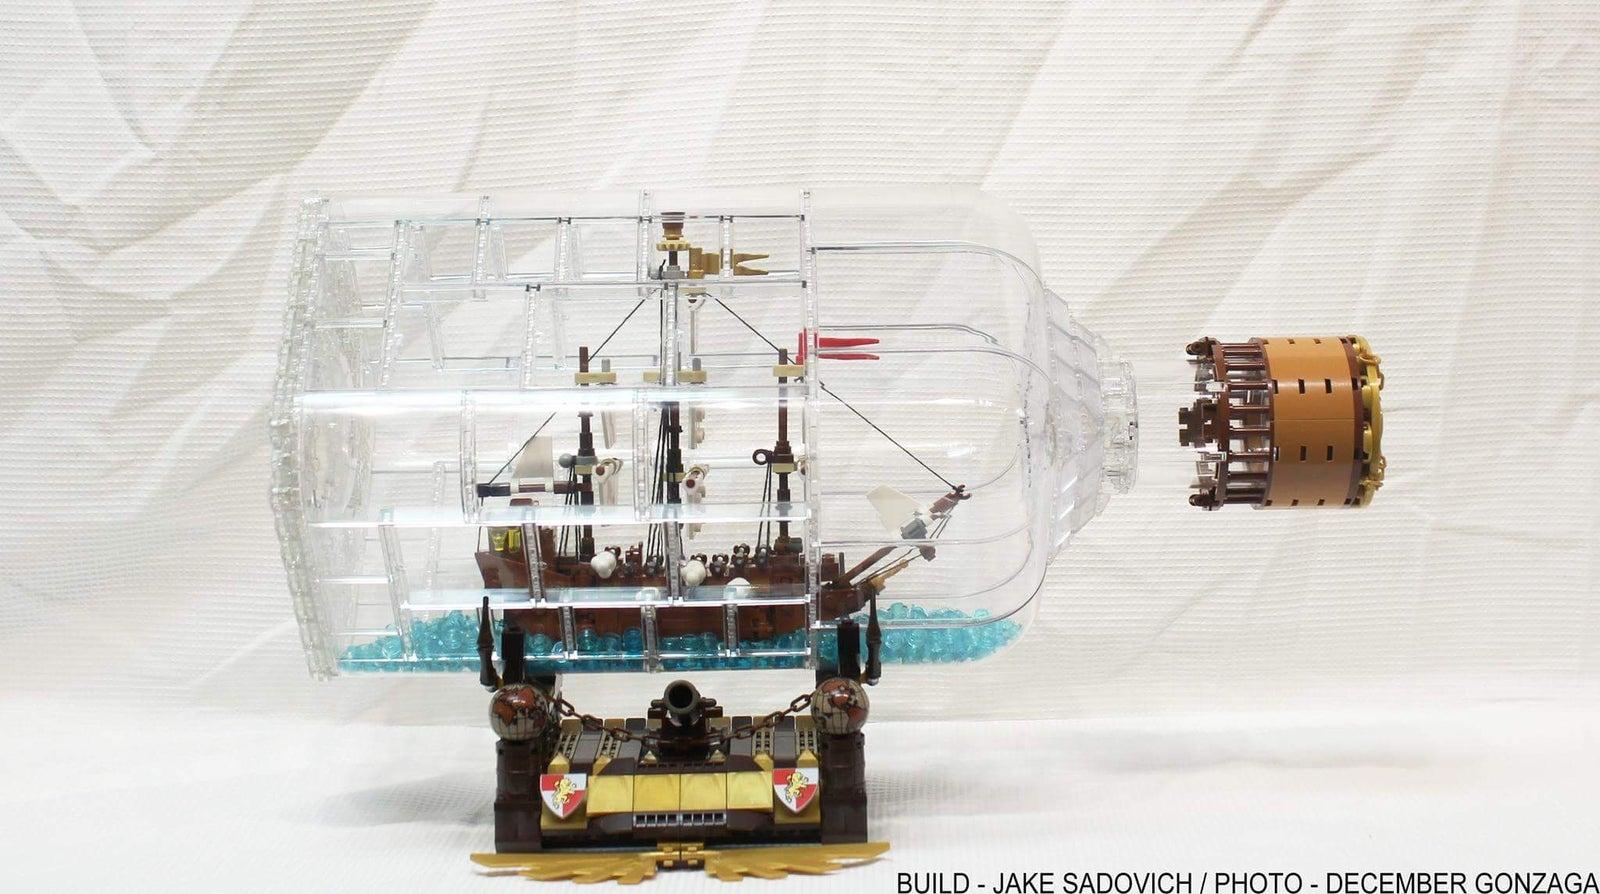 962 Piece Lego Ideas Ship in a Bottle 21313 Building Kit